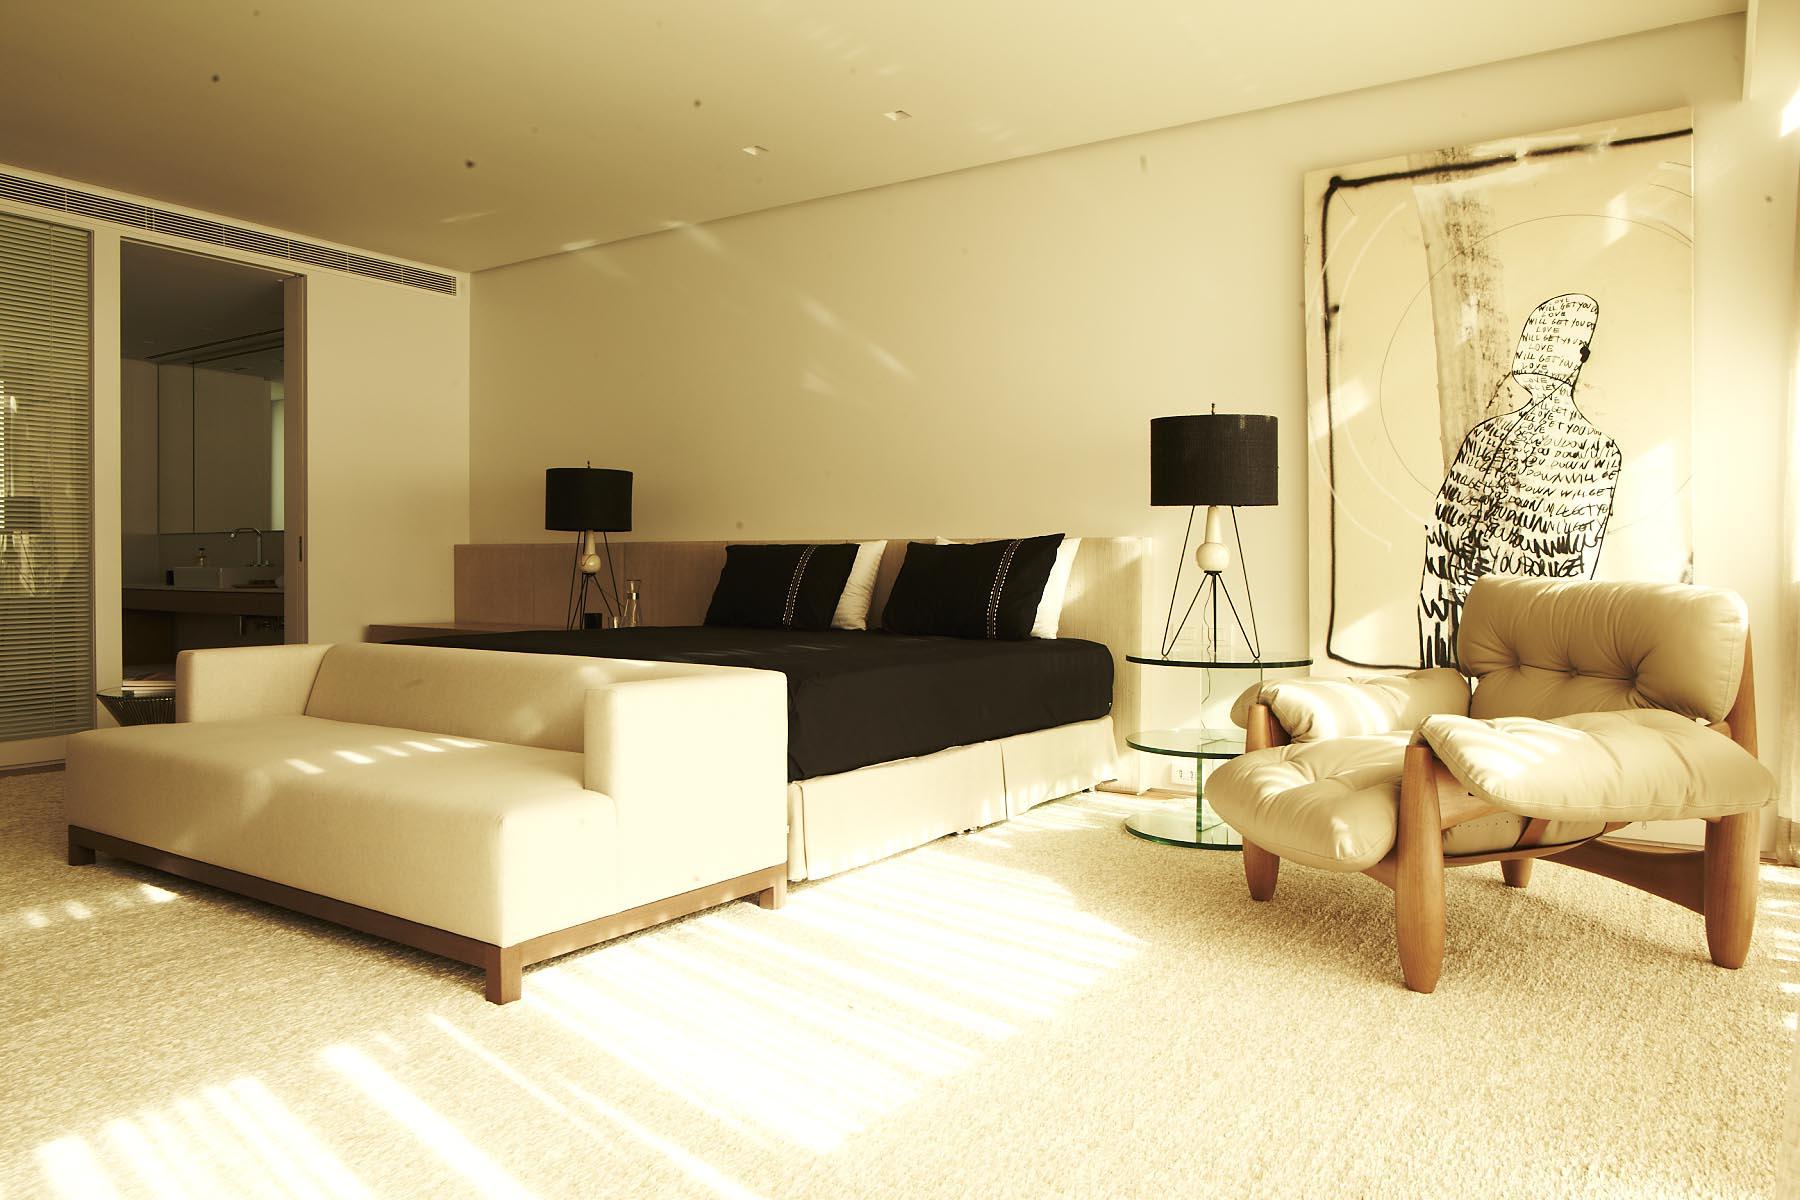 01-2012-os-apartamentos-vencedores-do-premio-casa-claudia-design-de-interiores